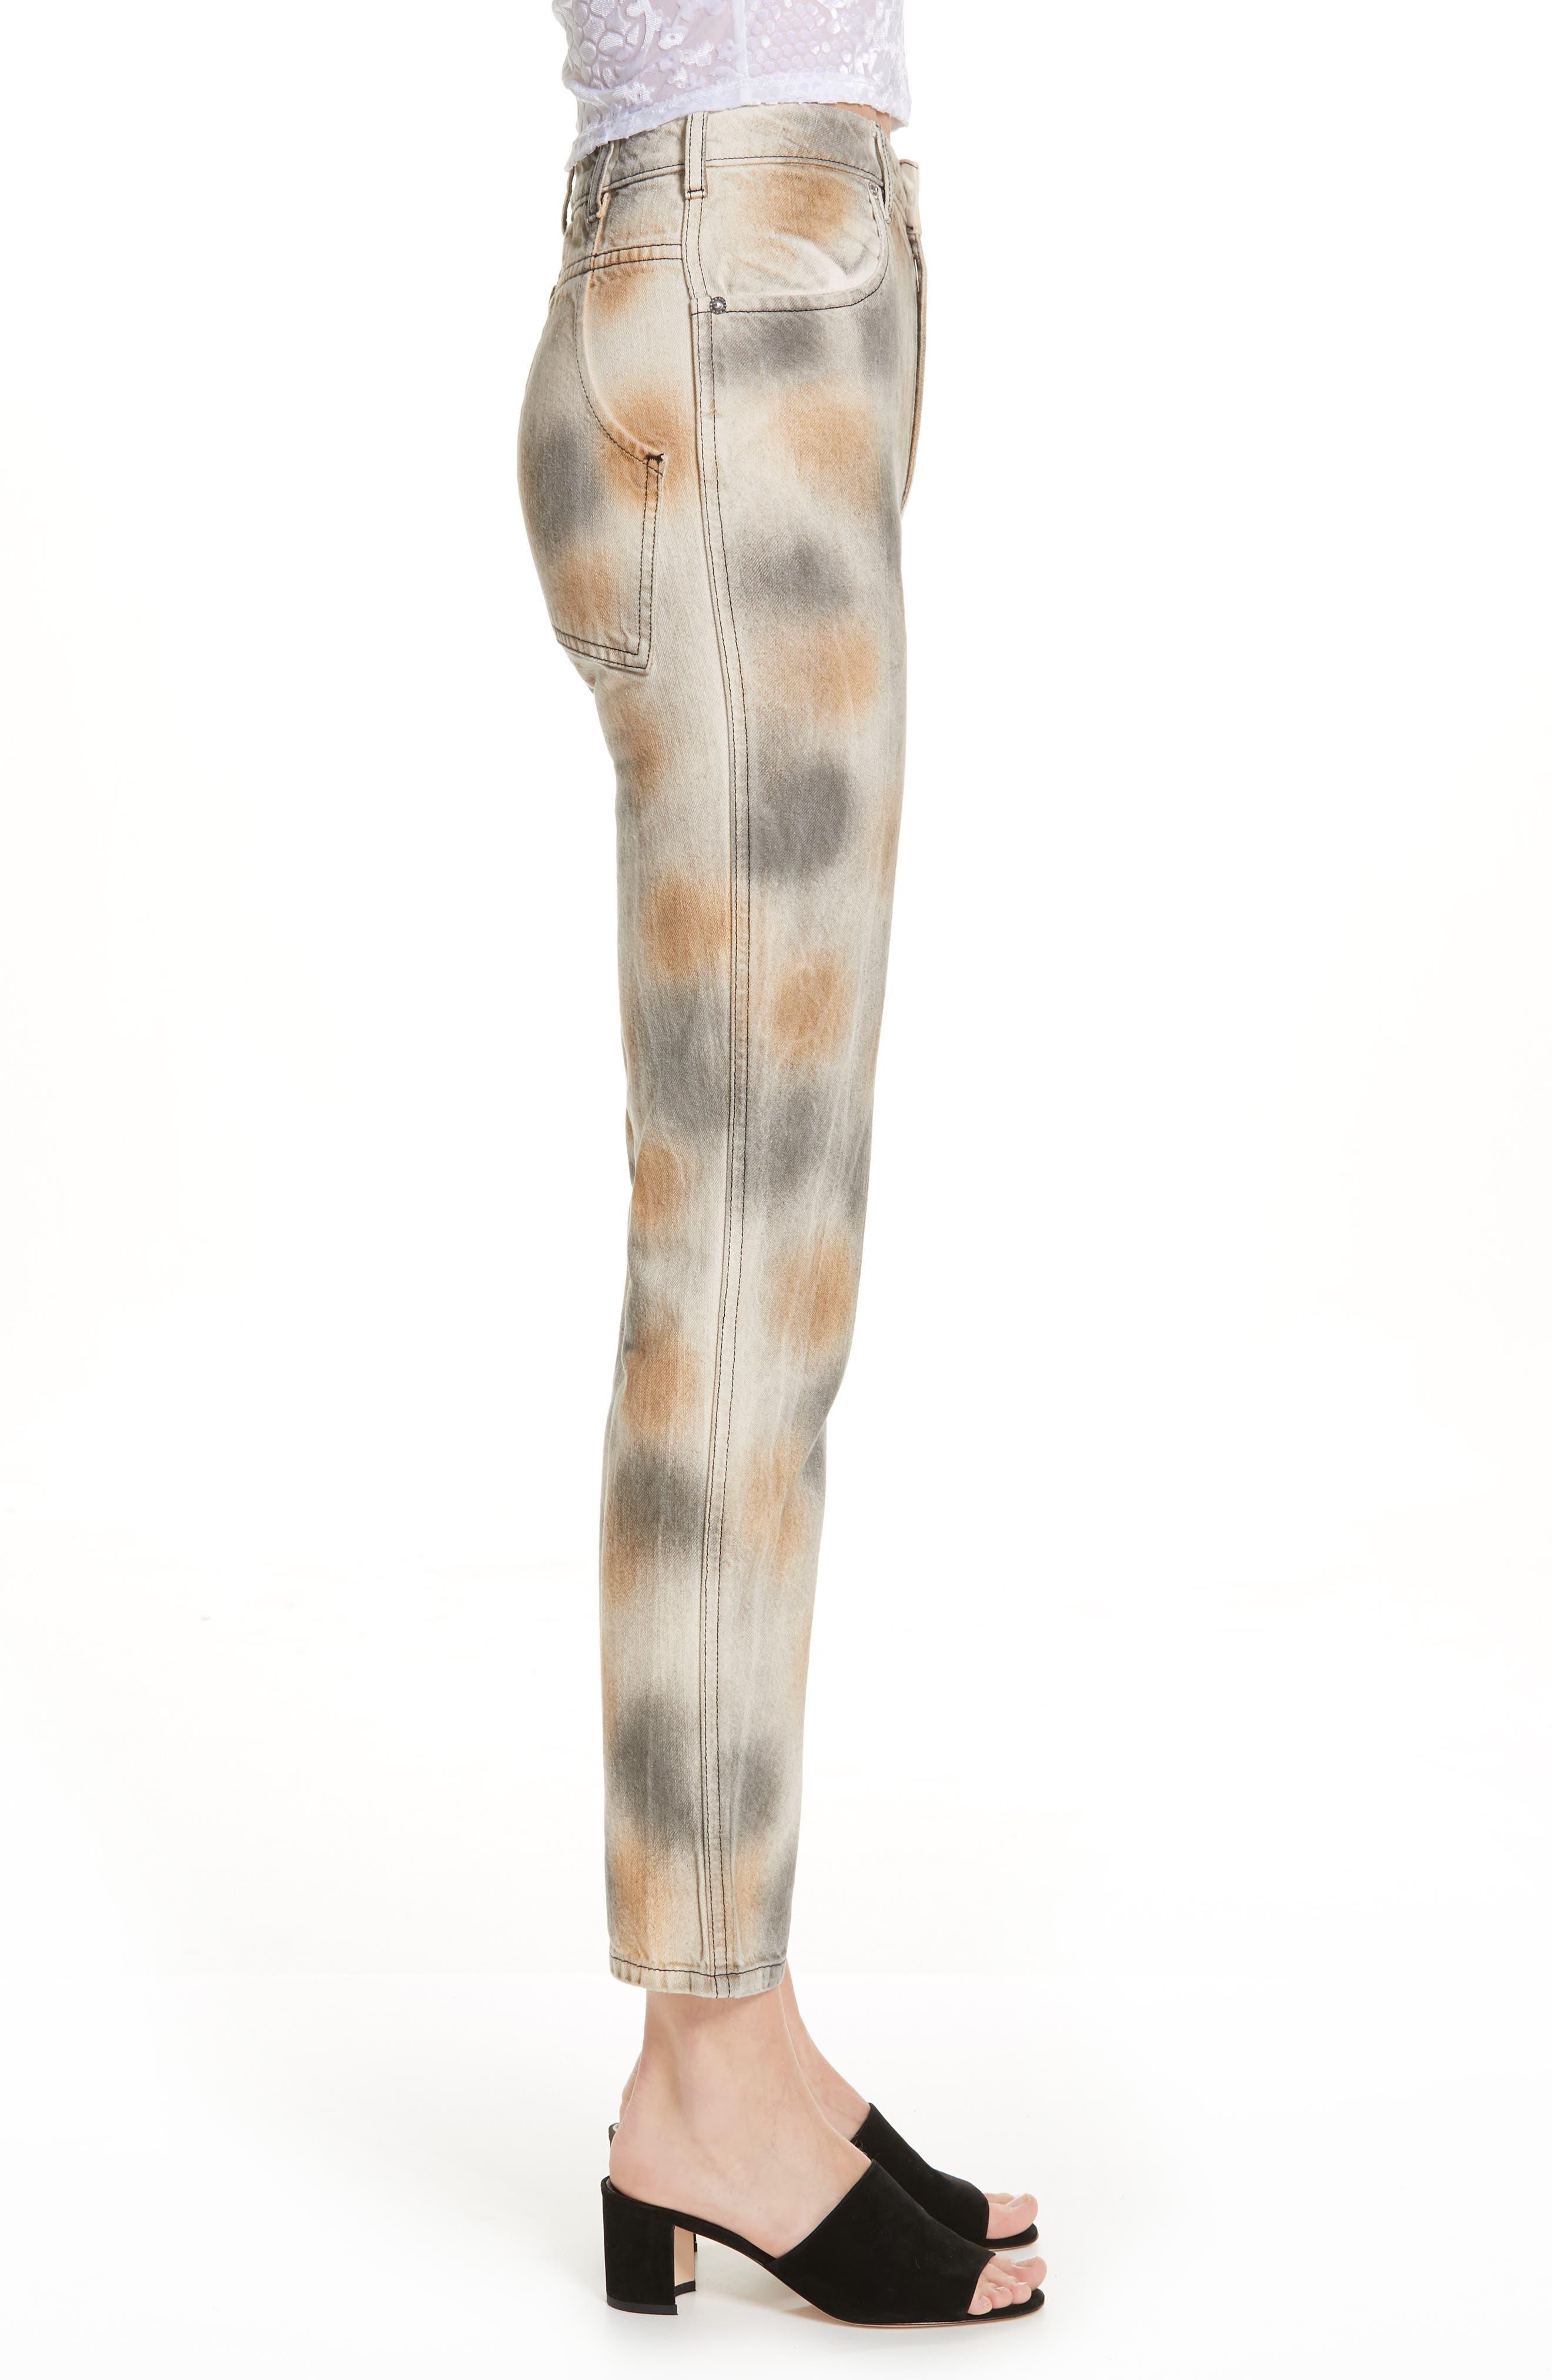 Echkaus Latta EL Tie Dye Straight Leg Jeans,                             Alternate thumbnail 3, color,                             DIRTY DYE